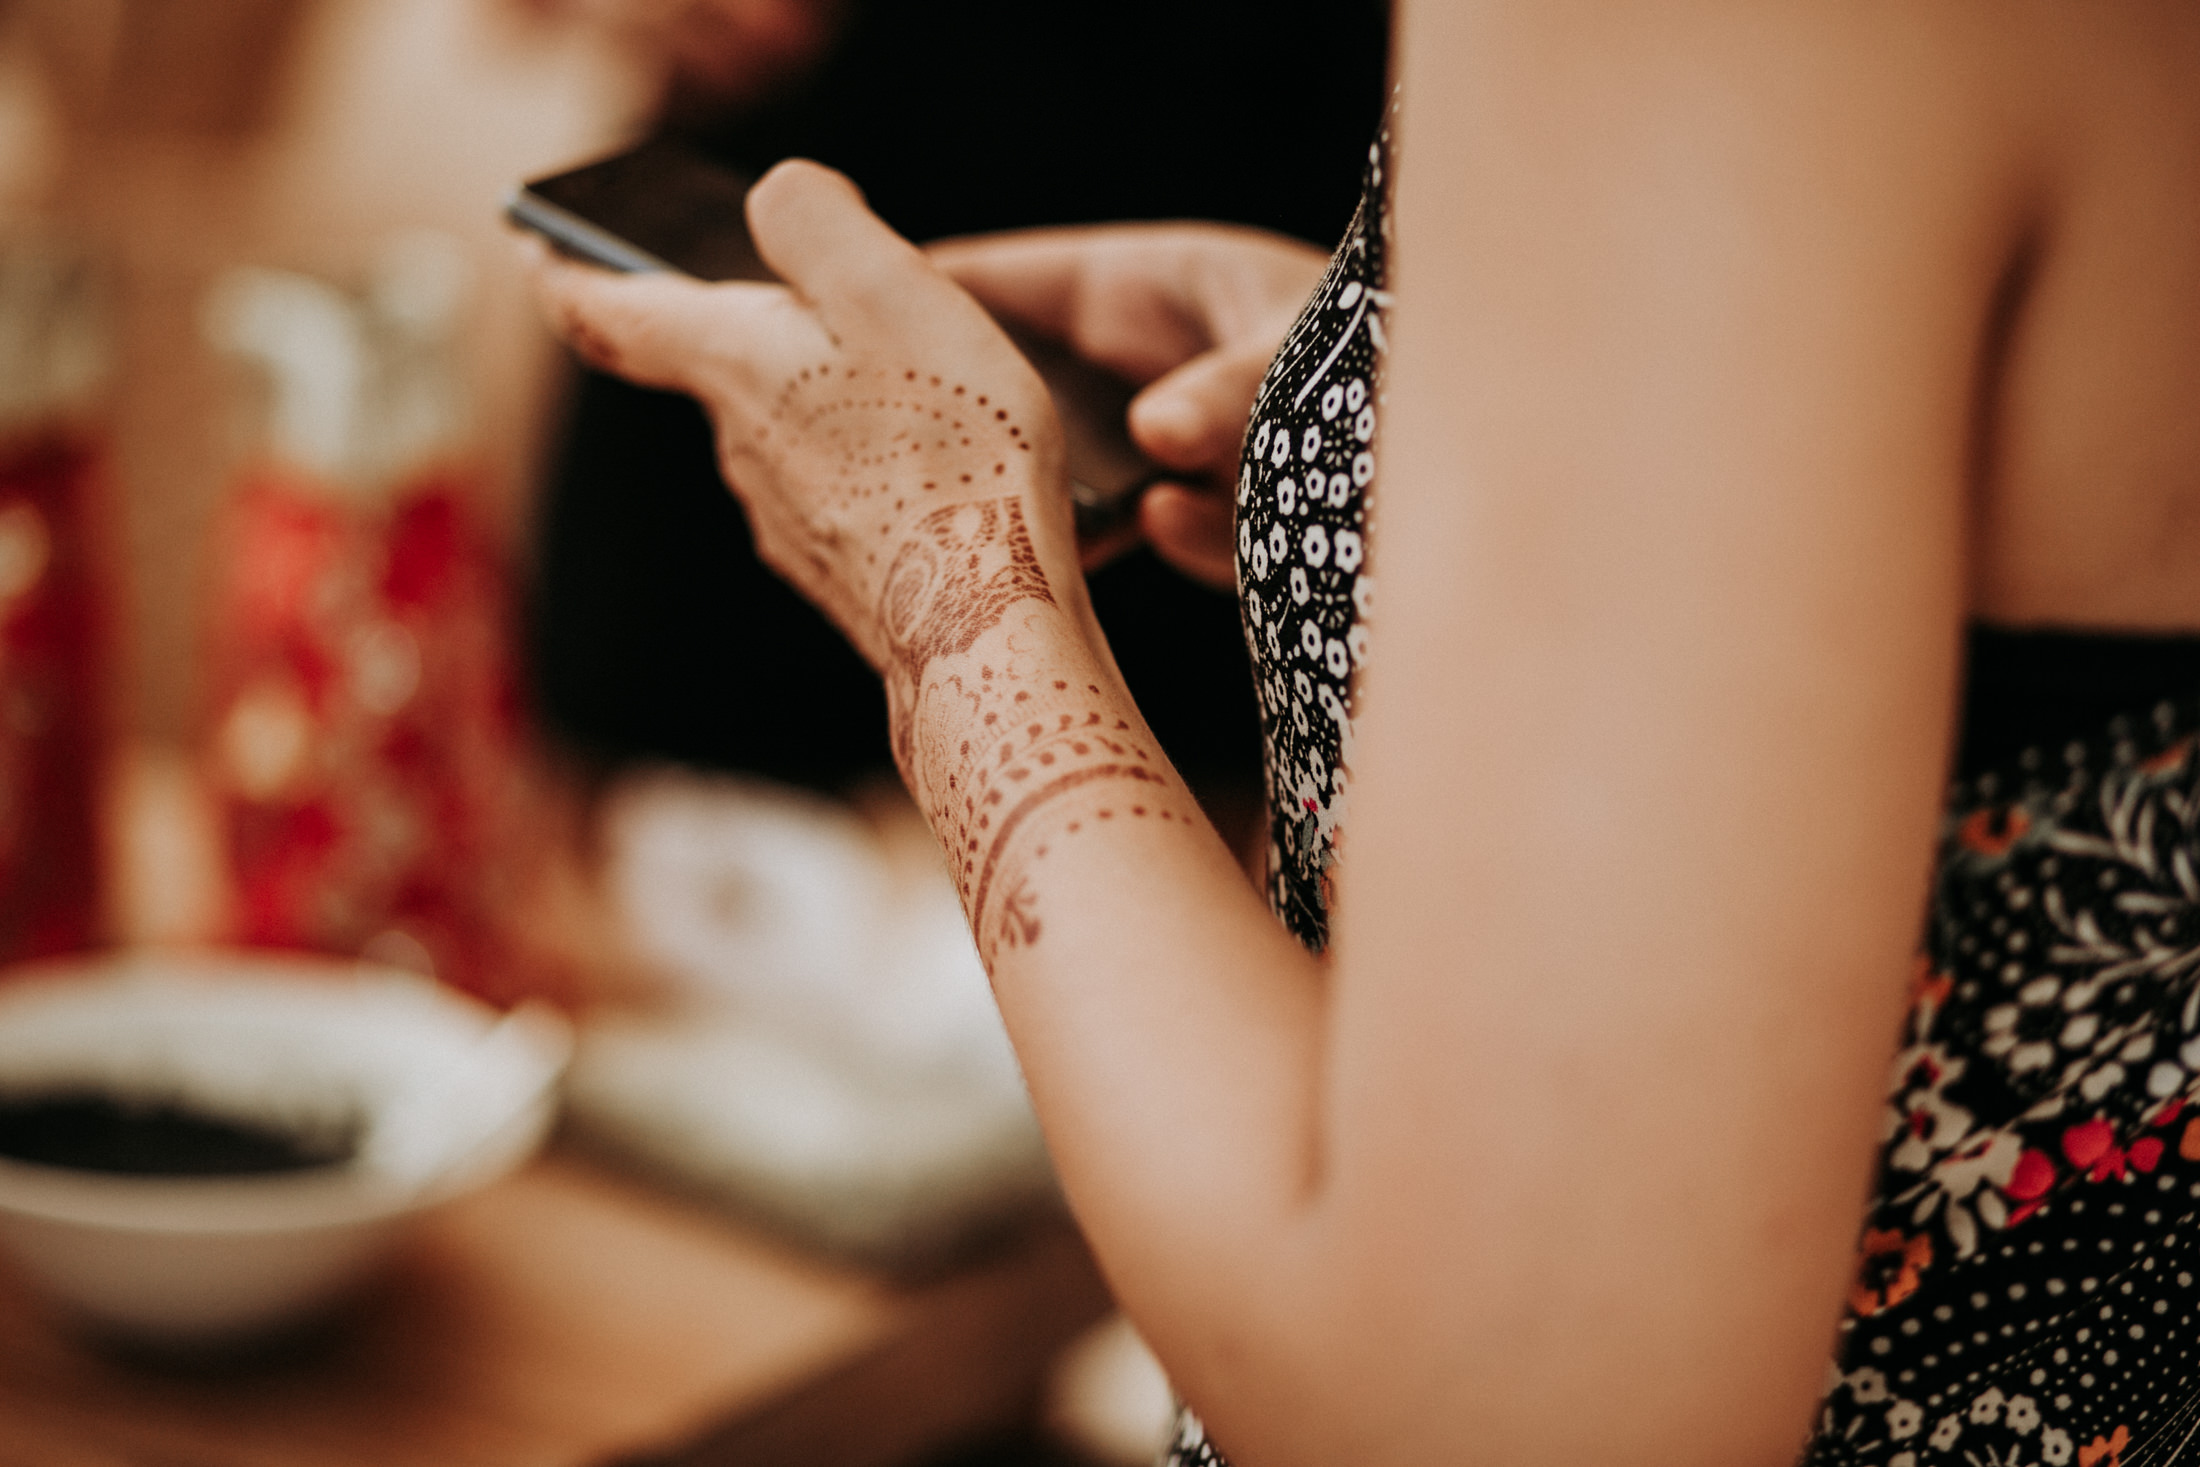 Wedding_Photographer_Mallorca_Daniela-Marquardt_Photography_New_York_Iceland_Tuscany_Santorini_Portugal_Austria_Bavaria_Elopement_Hochzeitsfotograf_AntjeRajat1_11